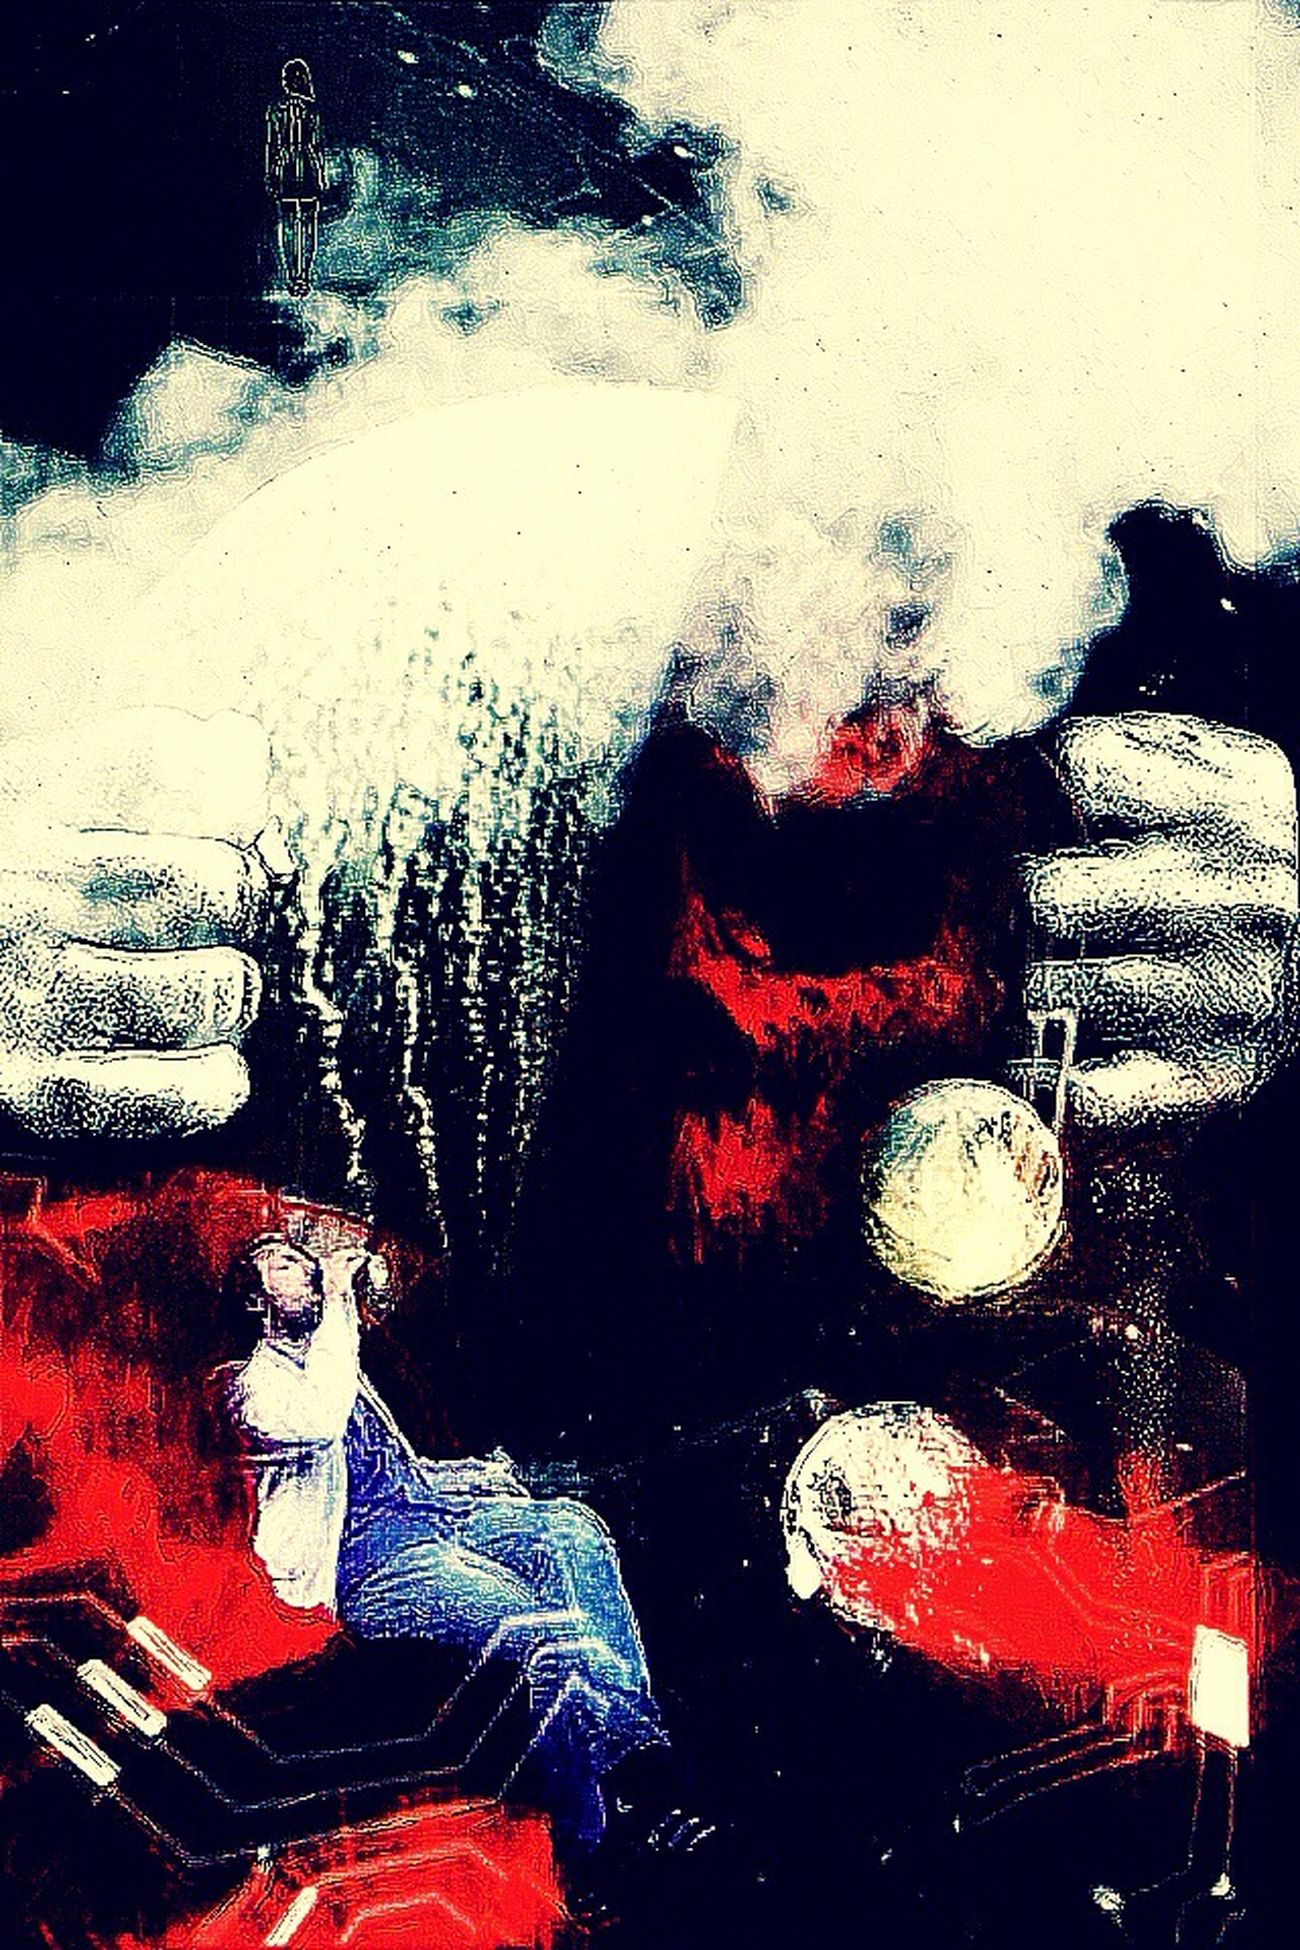 Musica Entre Ombre Et Lumiere Variation Freestyle Exploring The Subconscient Je Vends Ma Vie Comme Un Savon The Way Forward From My Point Of View We Drink Too Houston Scifiesque It does not surprise me it does not worry me , c'est sérieux !;)